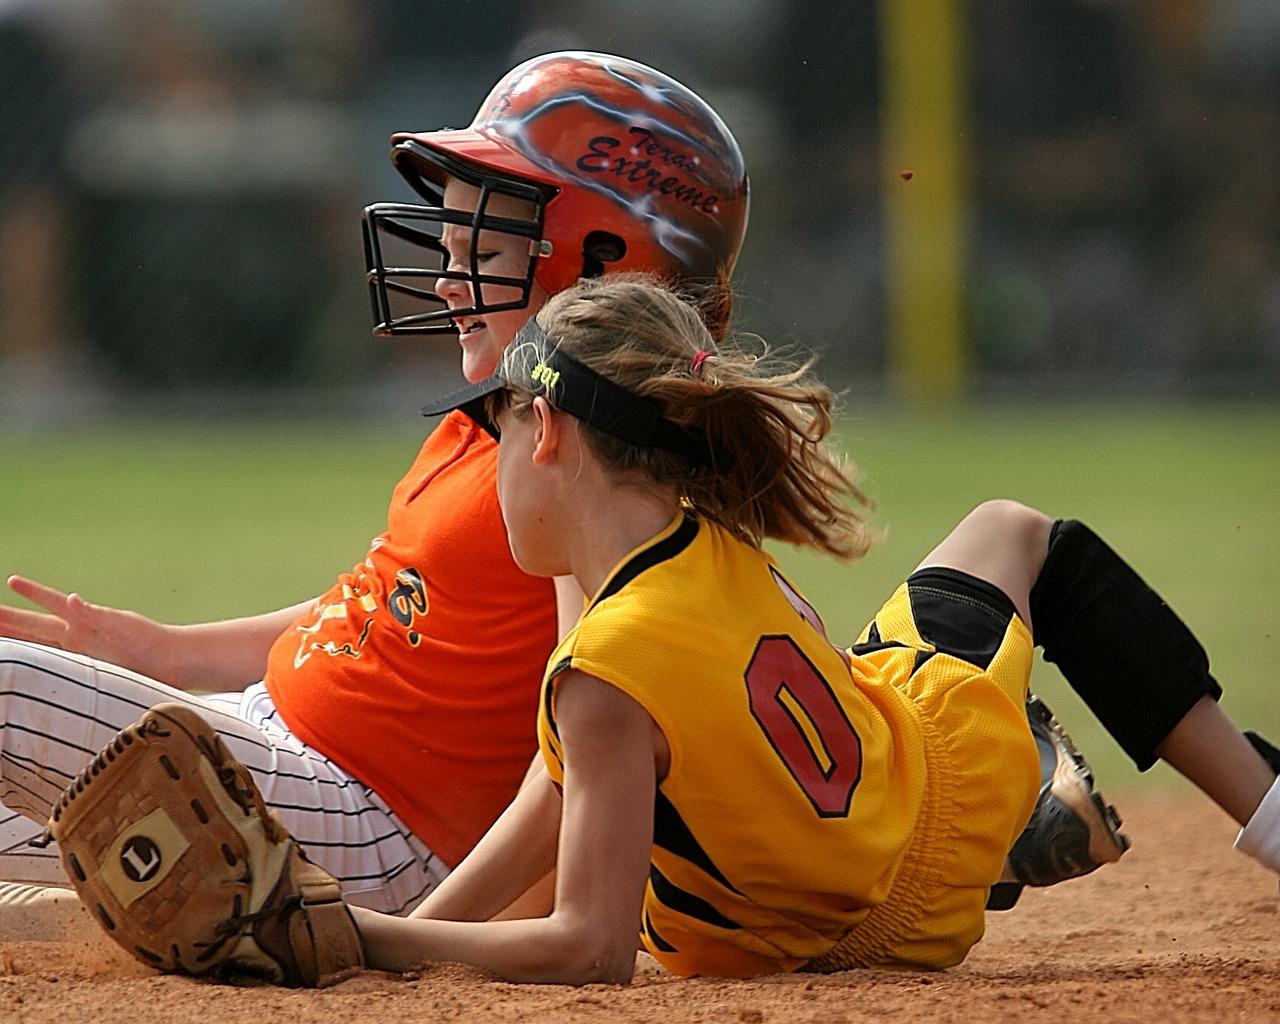 softball-1577610_1280